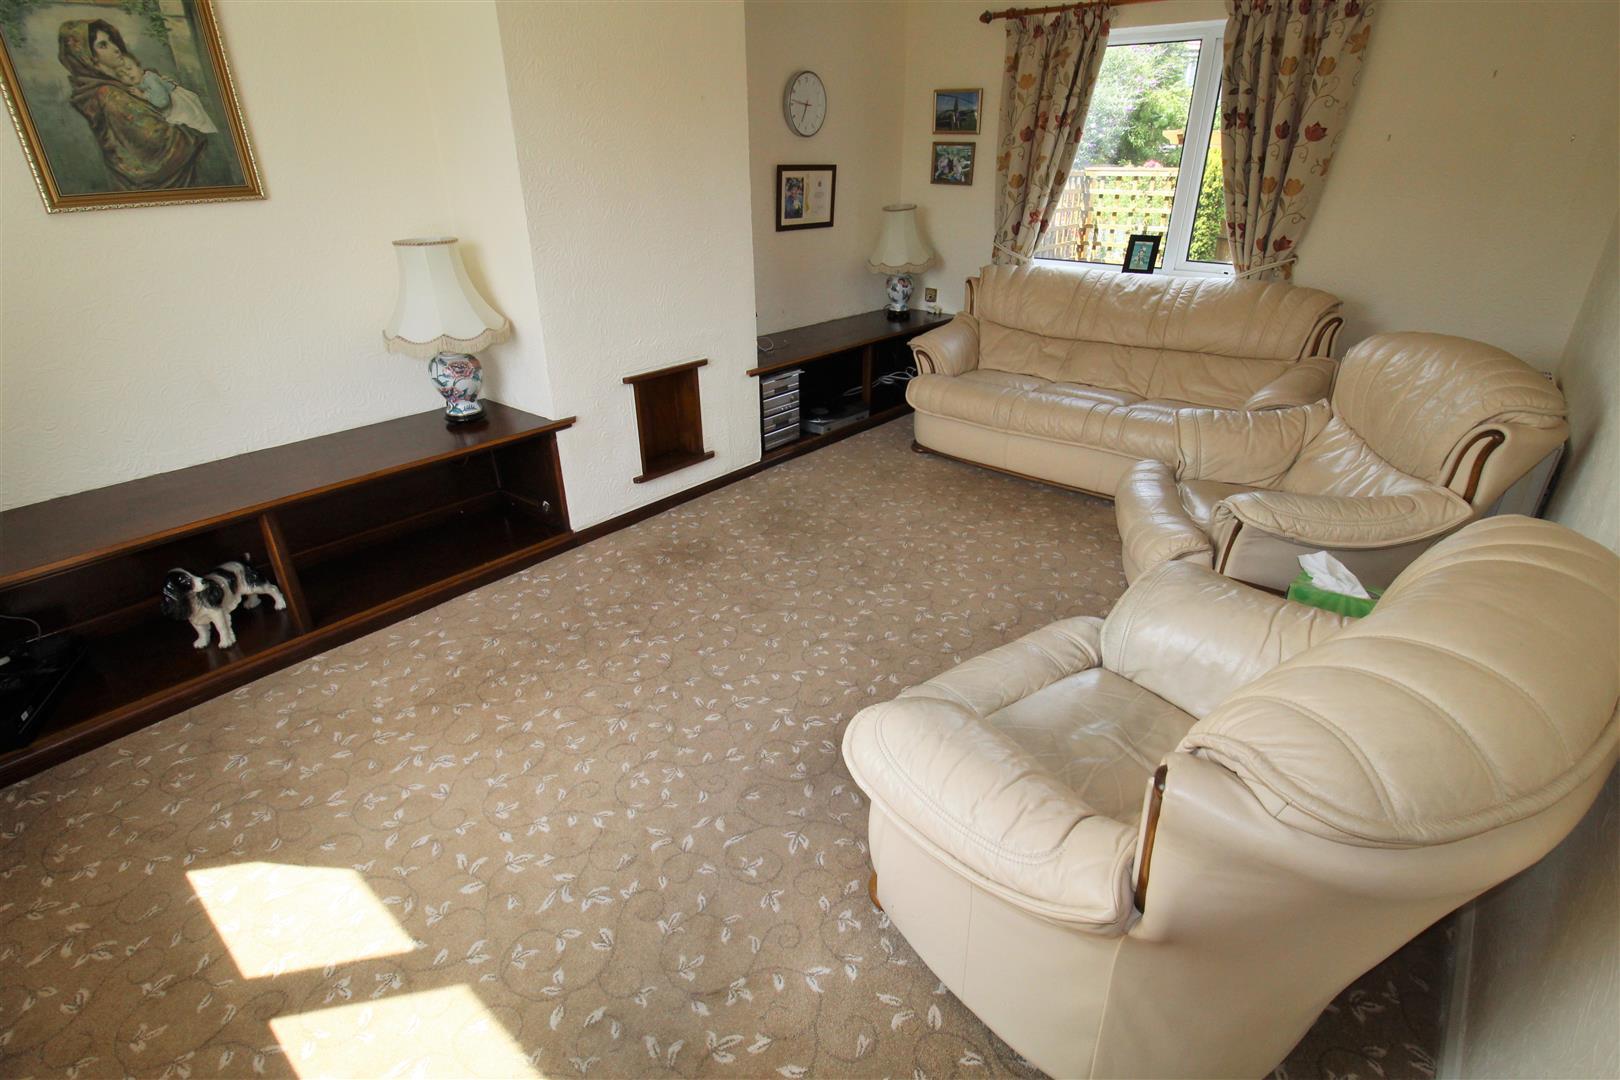 3 Bedrooms, House - Semi-Detached, Deerbarn Drive, Bootle